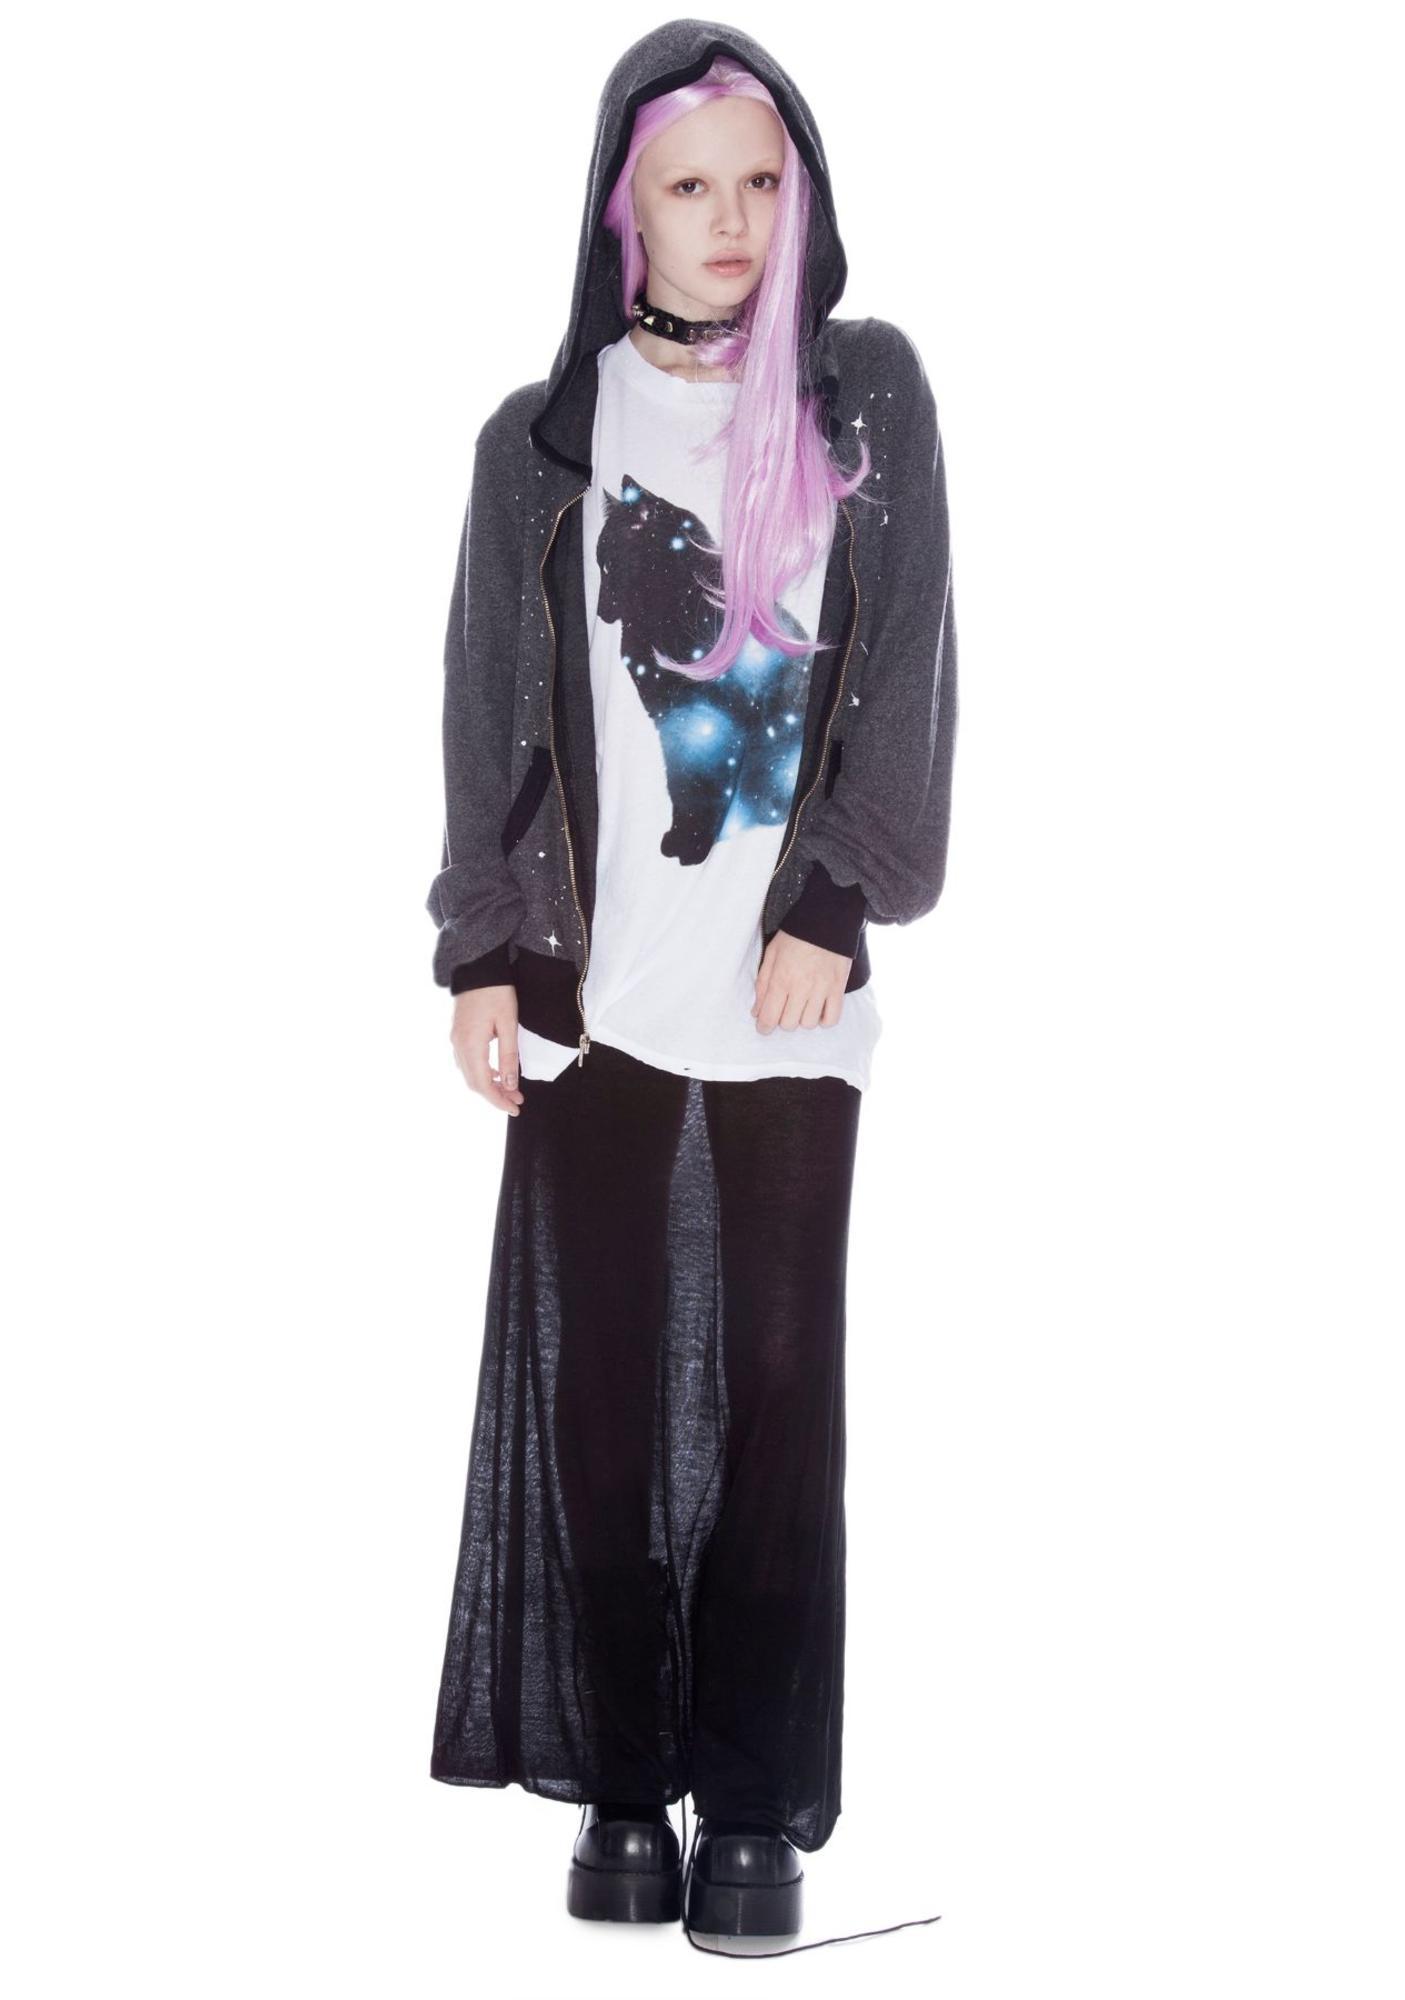 Wildfox Couture Malibu Zip Up I Believe Hoodie